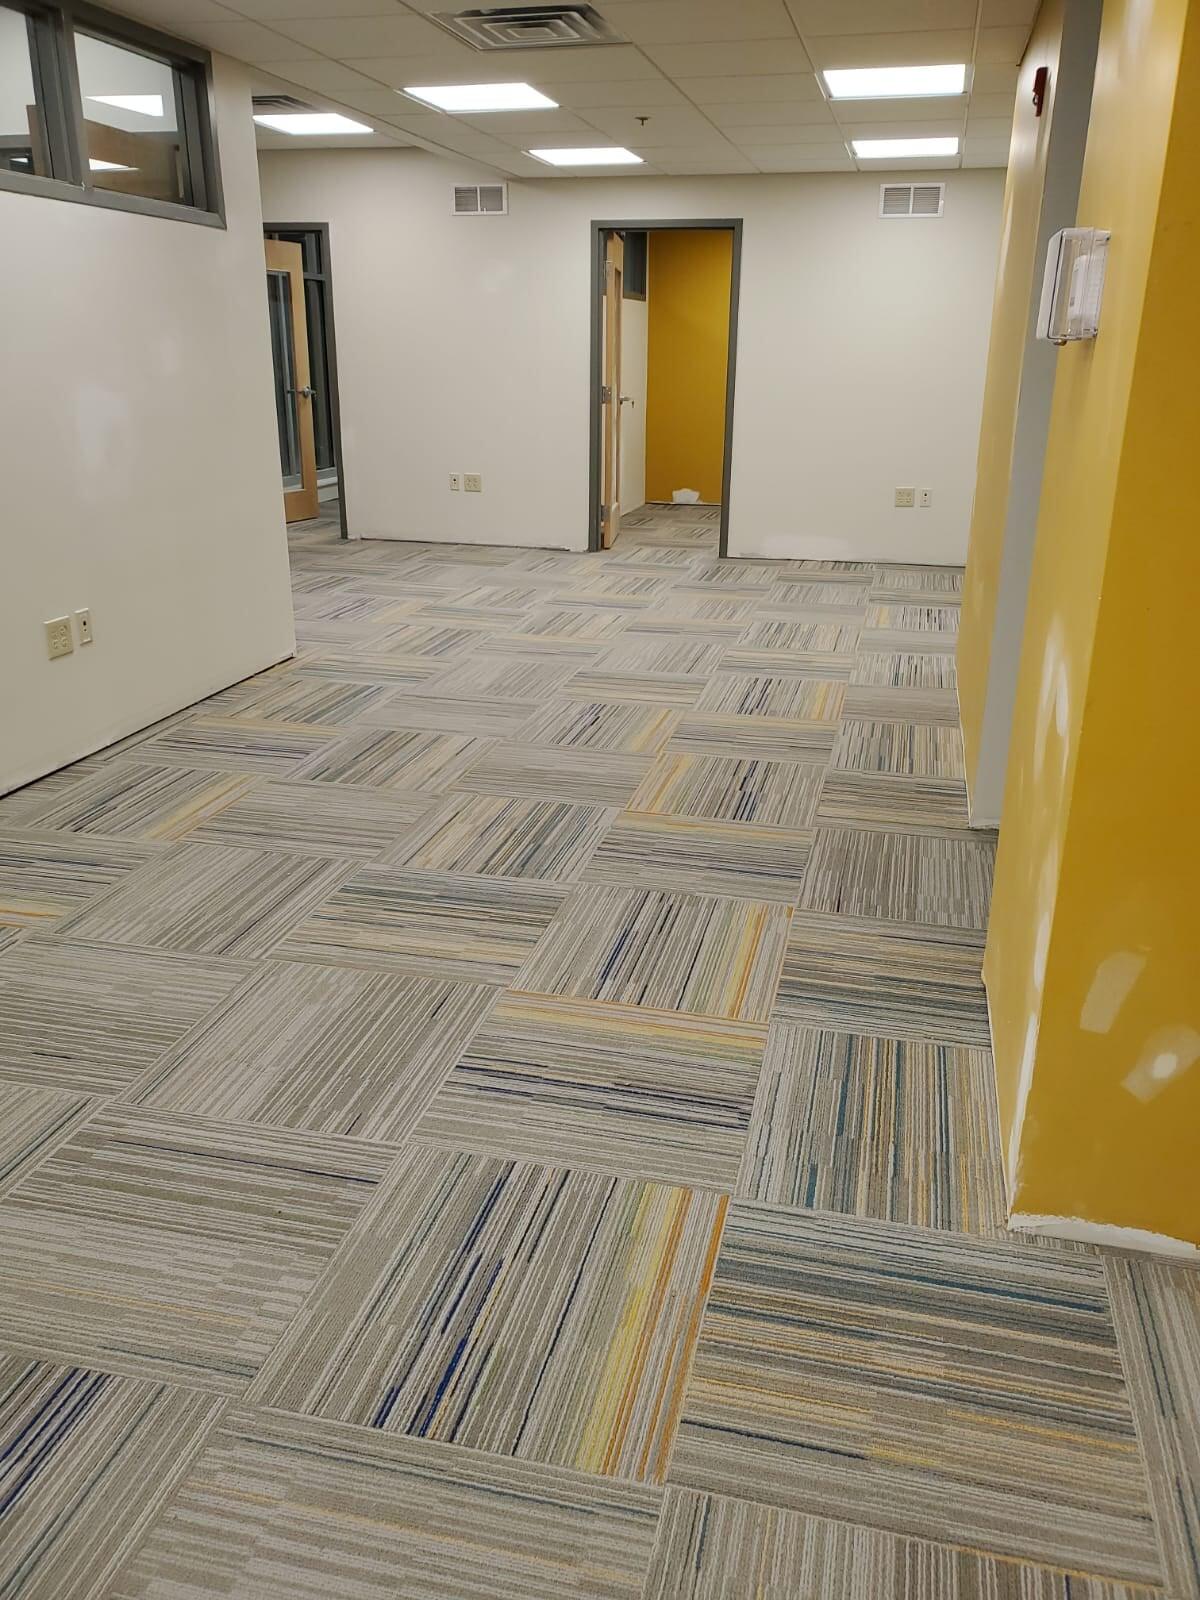 Carpet tile installation in Norris Square, PA from Philadelphia Flooring Solutions